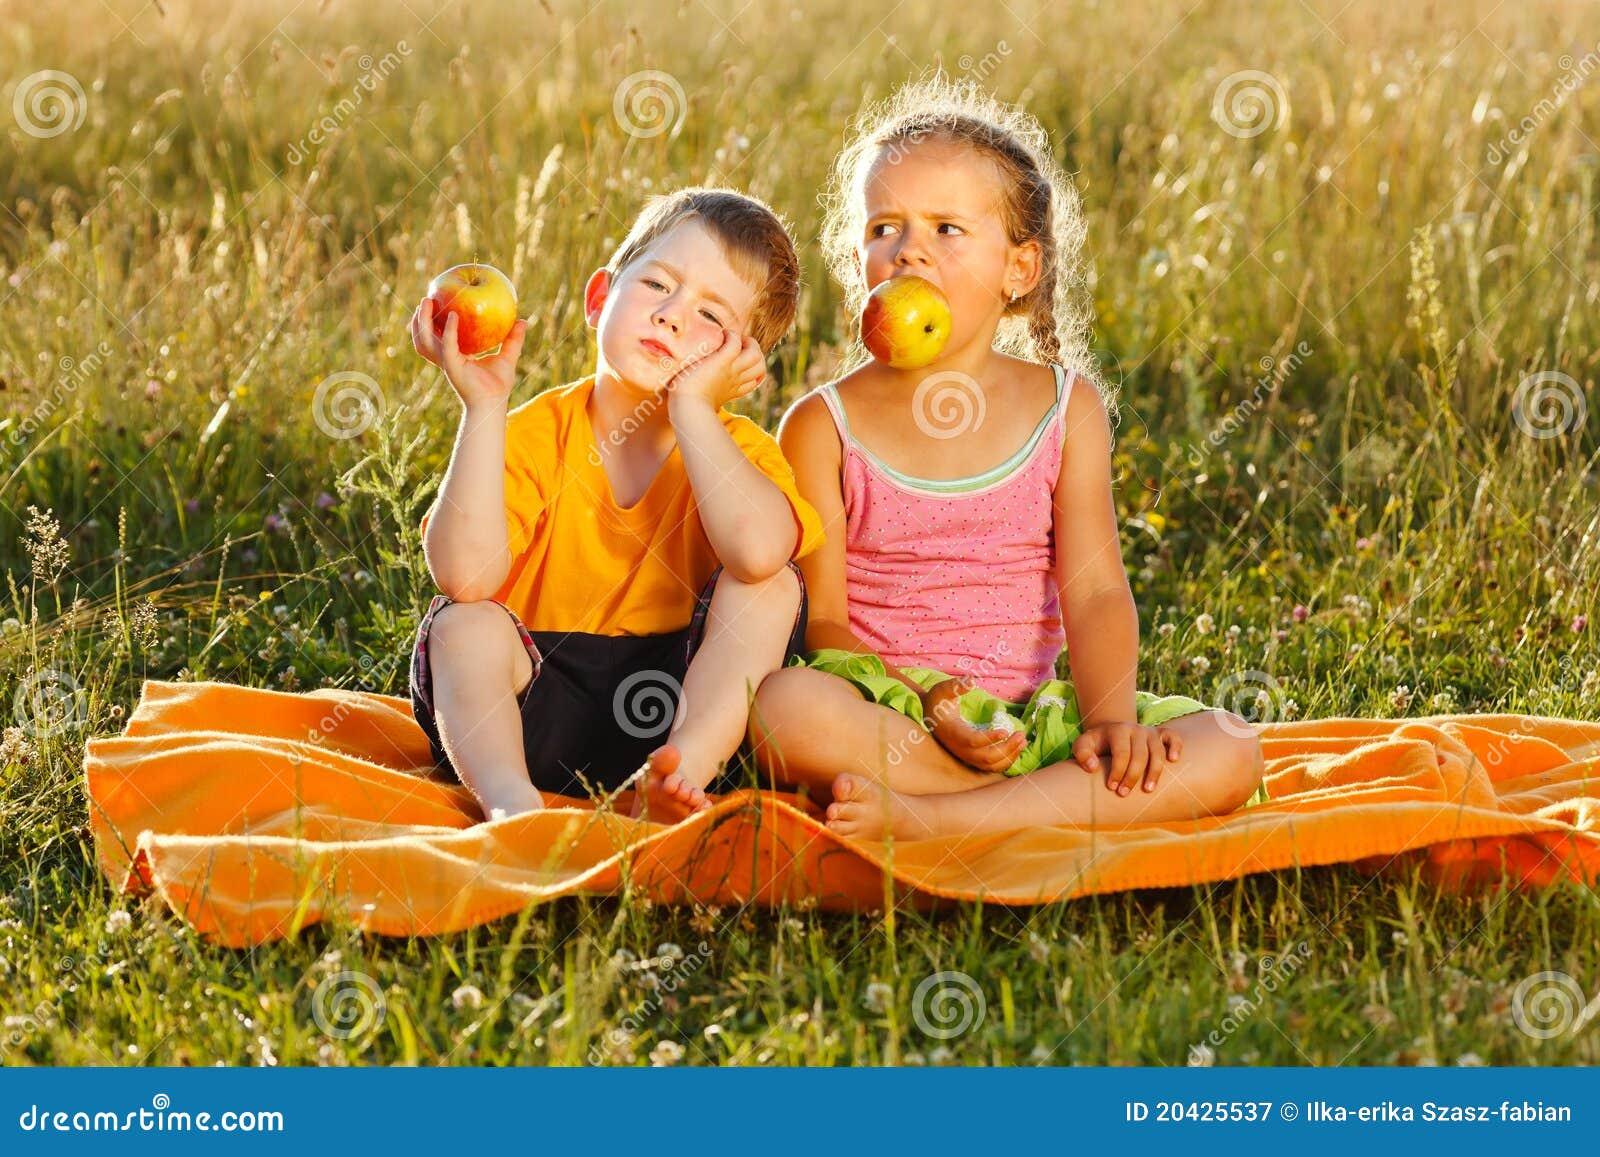 Little girl and boy eating apple